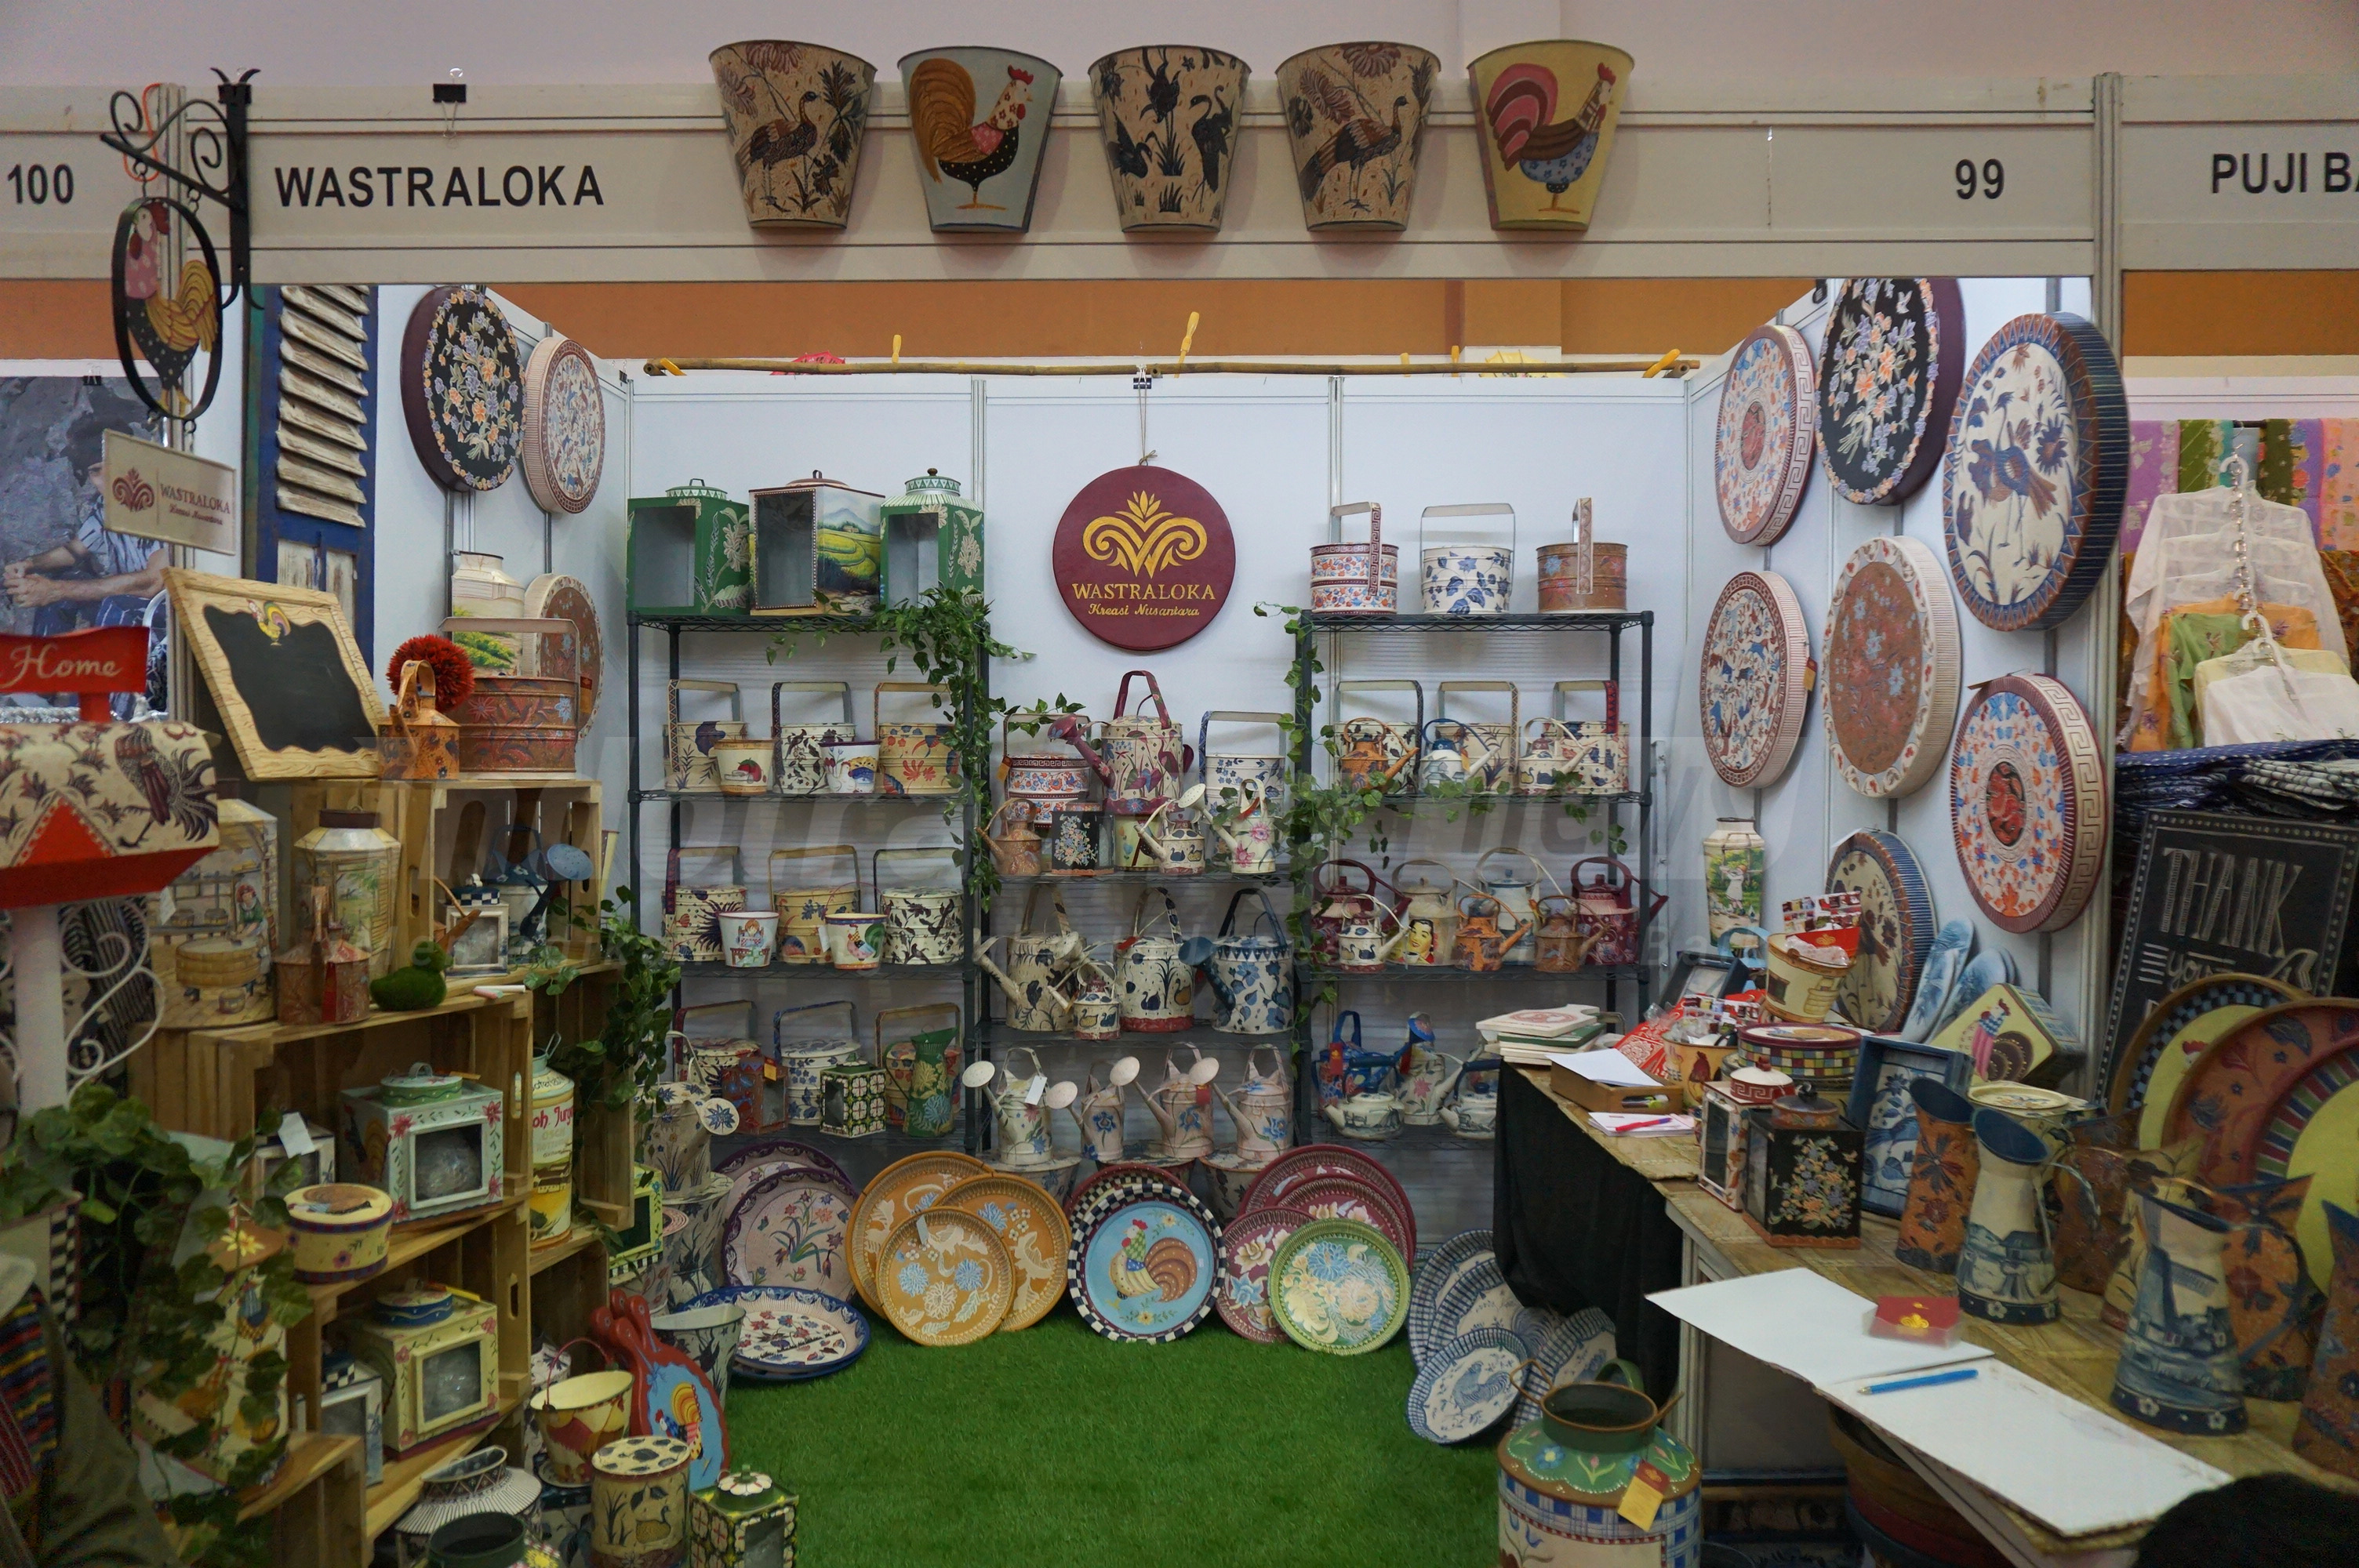 Foto: berbagai jenis produk kerajinan tangan Wastraloka/ Dok: indotrading.com